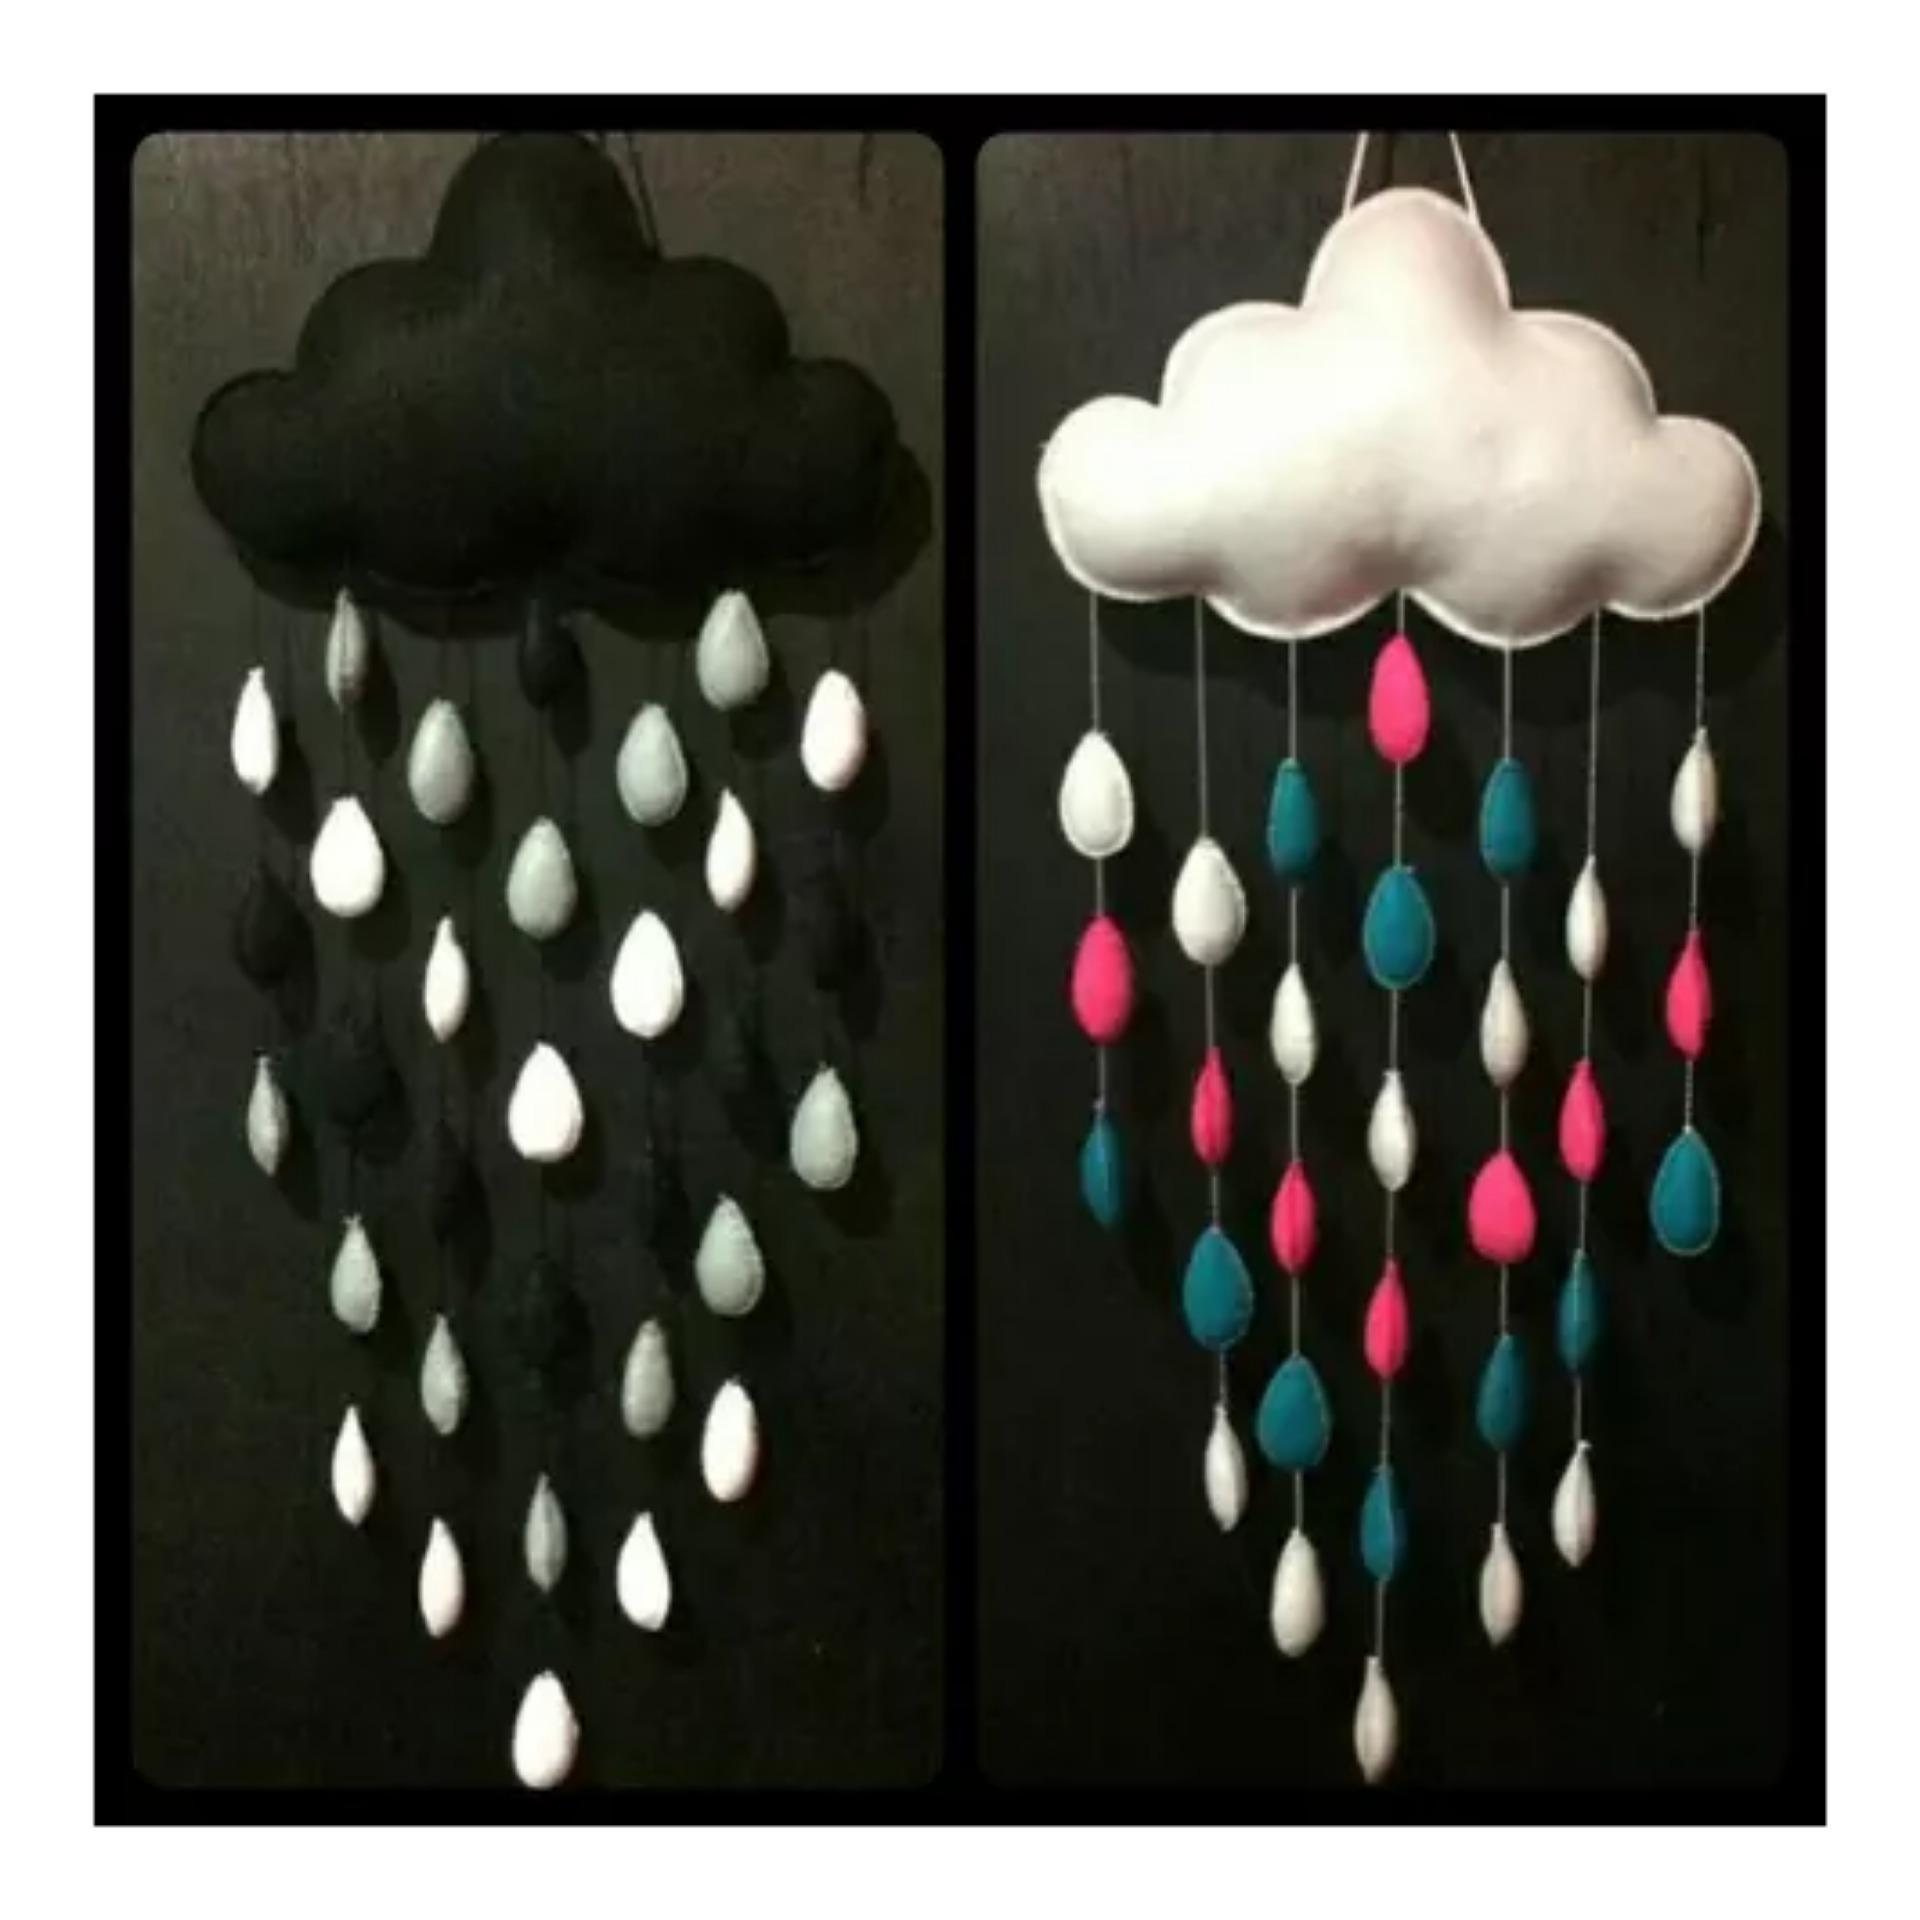 Bantal Awan Hujan Handmade, Dekorasi, Hiasan Kamar Tidur, Pernak Pernik Rumah, Rumah